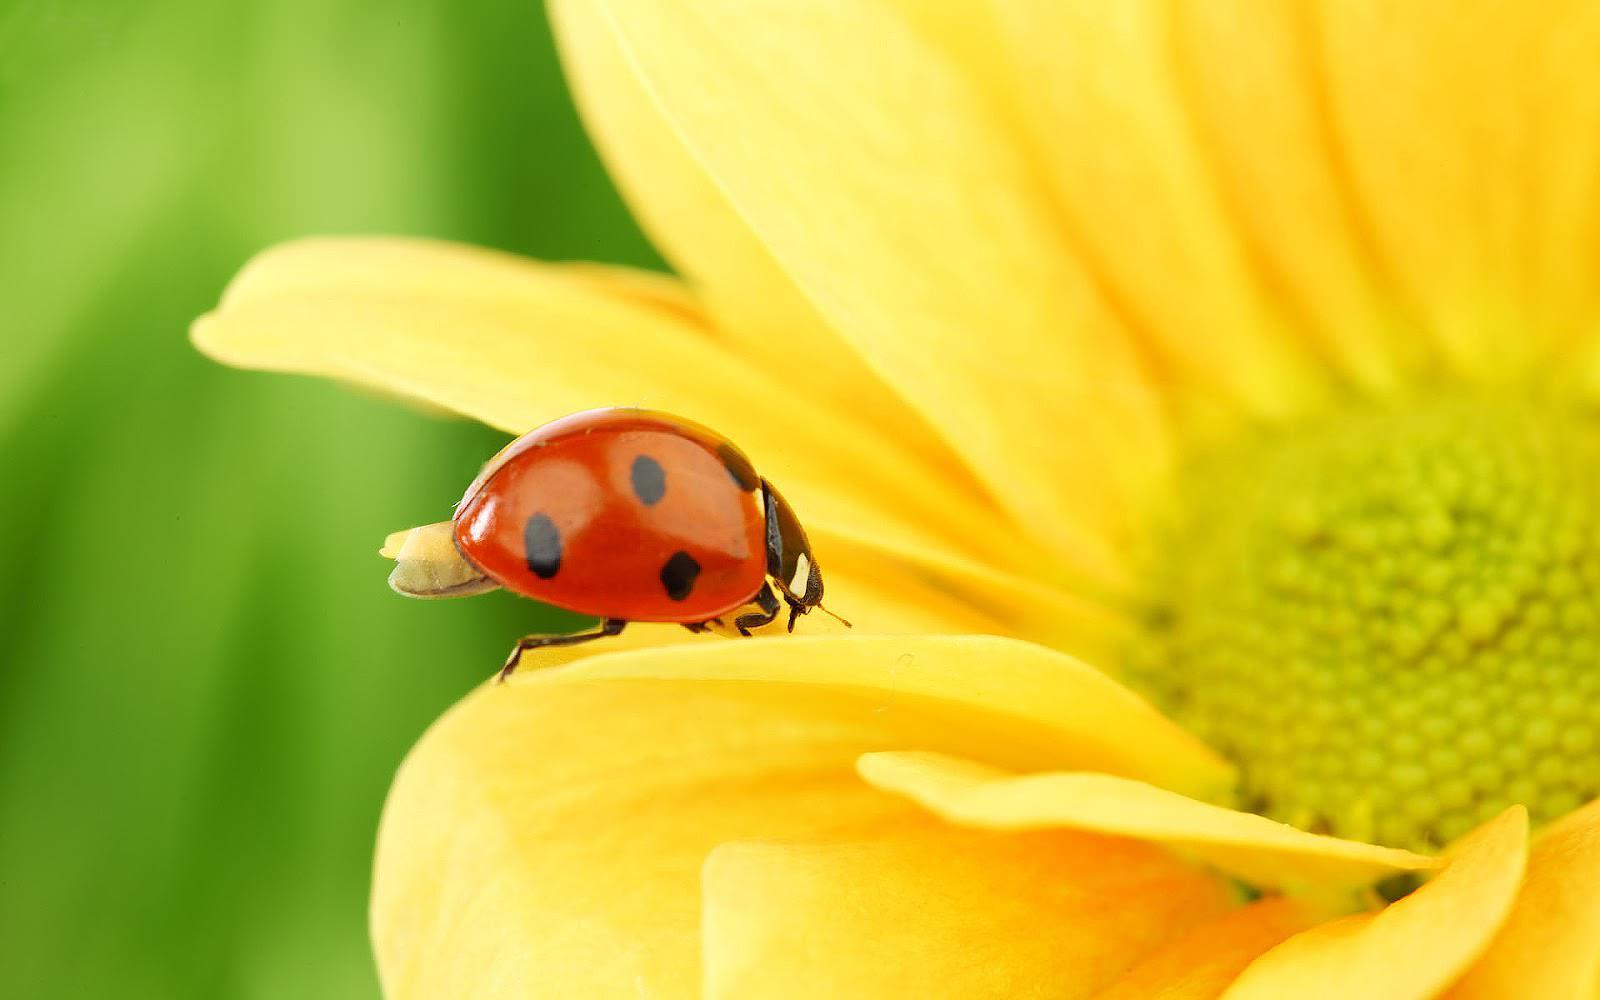 Elegant Ladybug Wallpaper